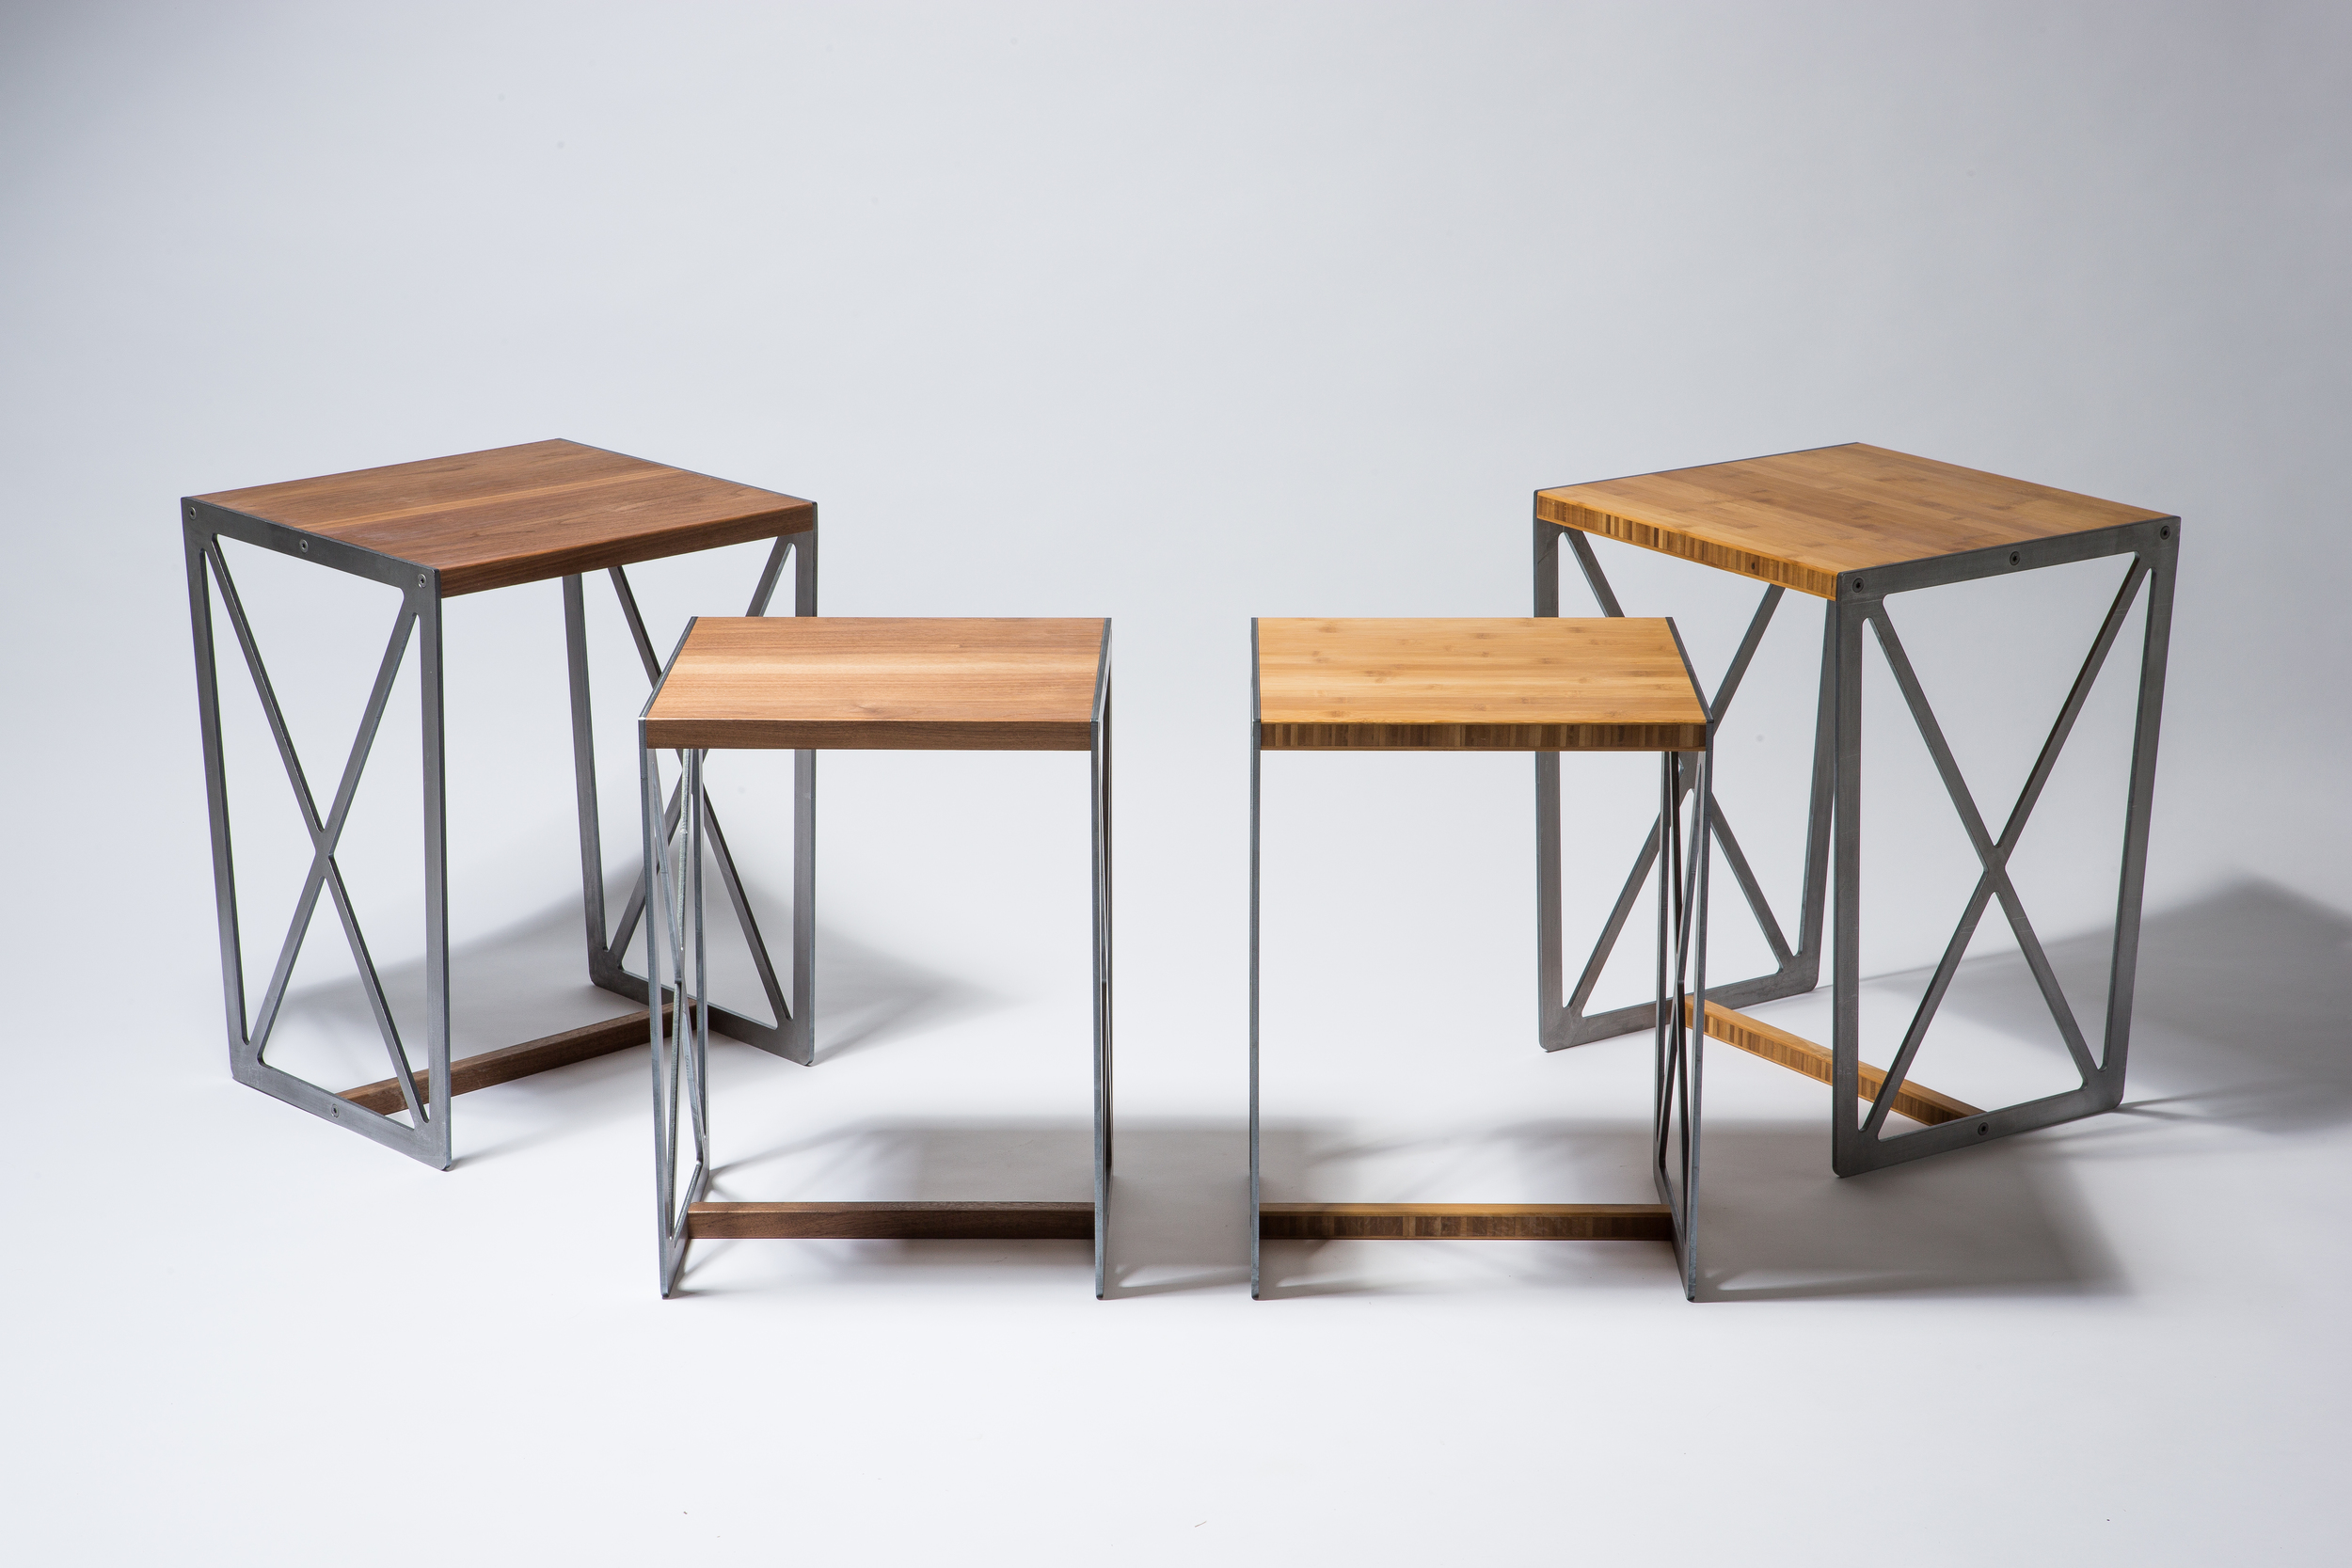 23-RIchard-Ganas-Tables-8965.jpg